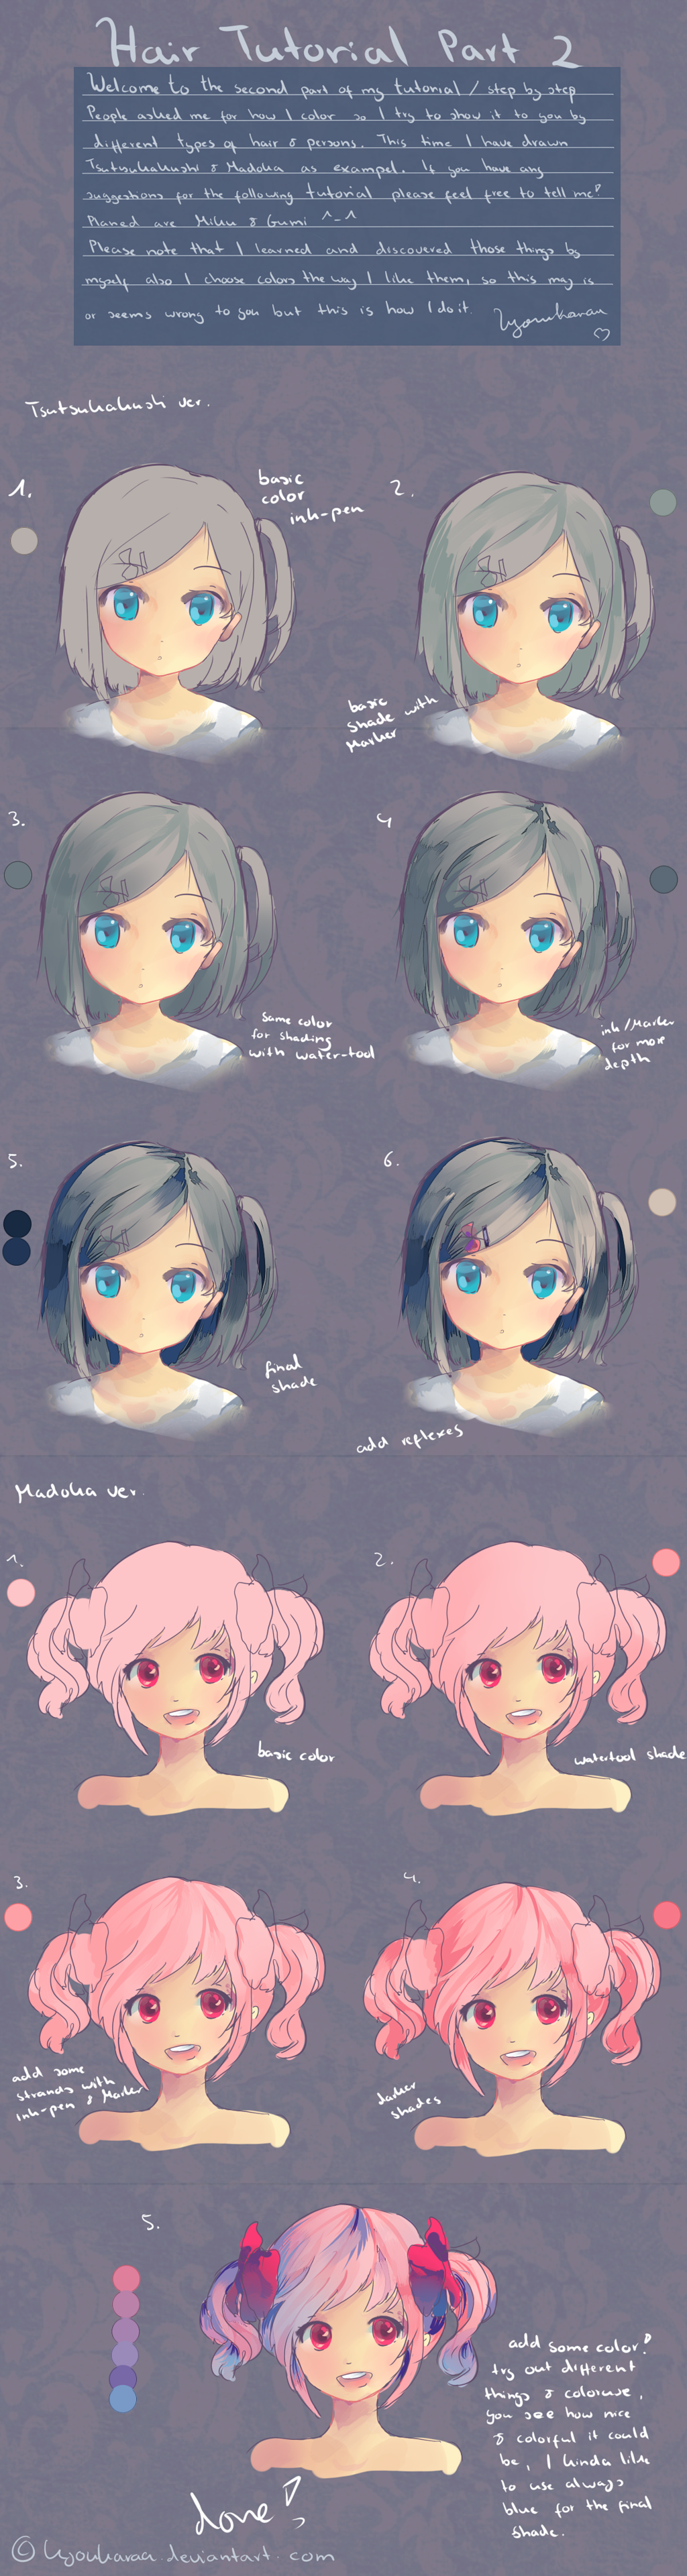 Hair Tutorial Part 2 by KyouKaraaviantart on deviantART